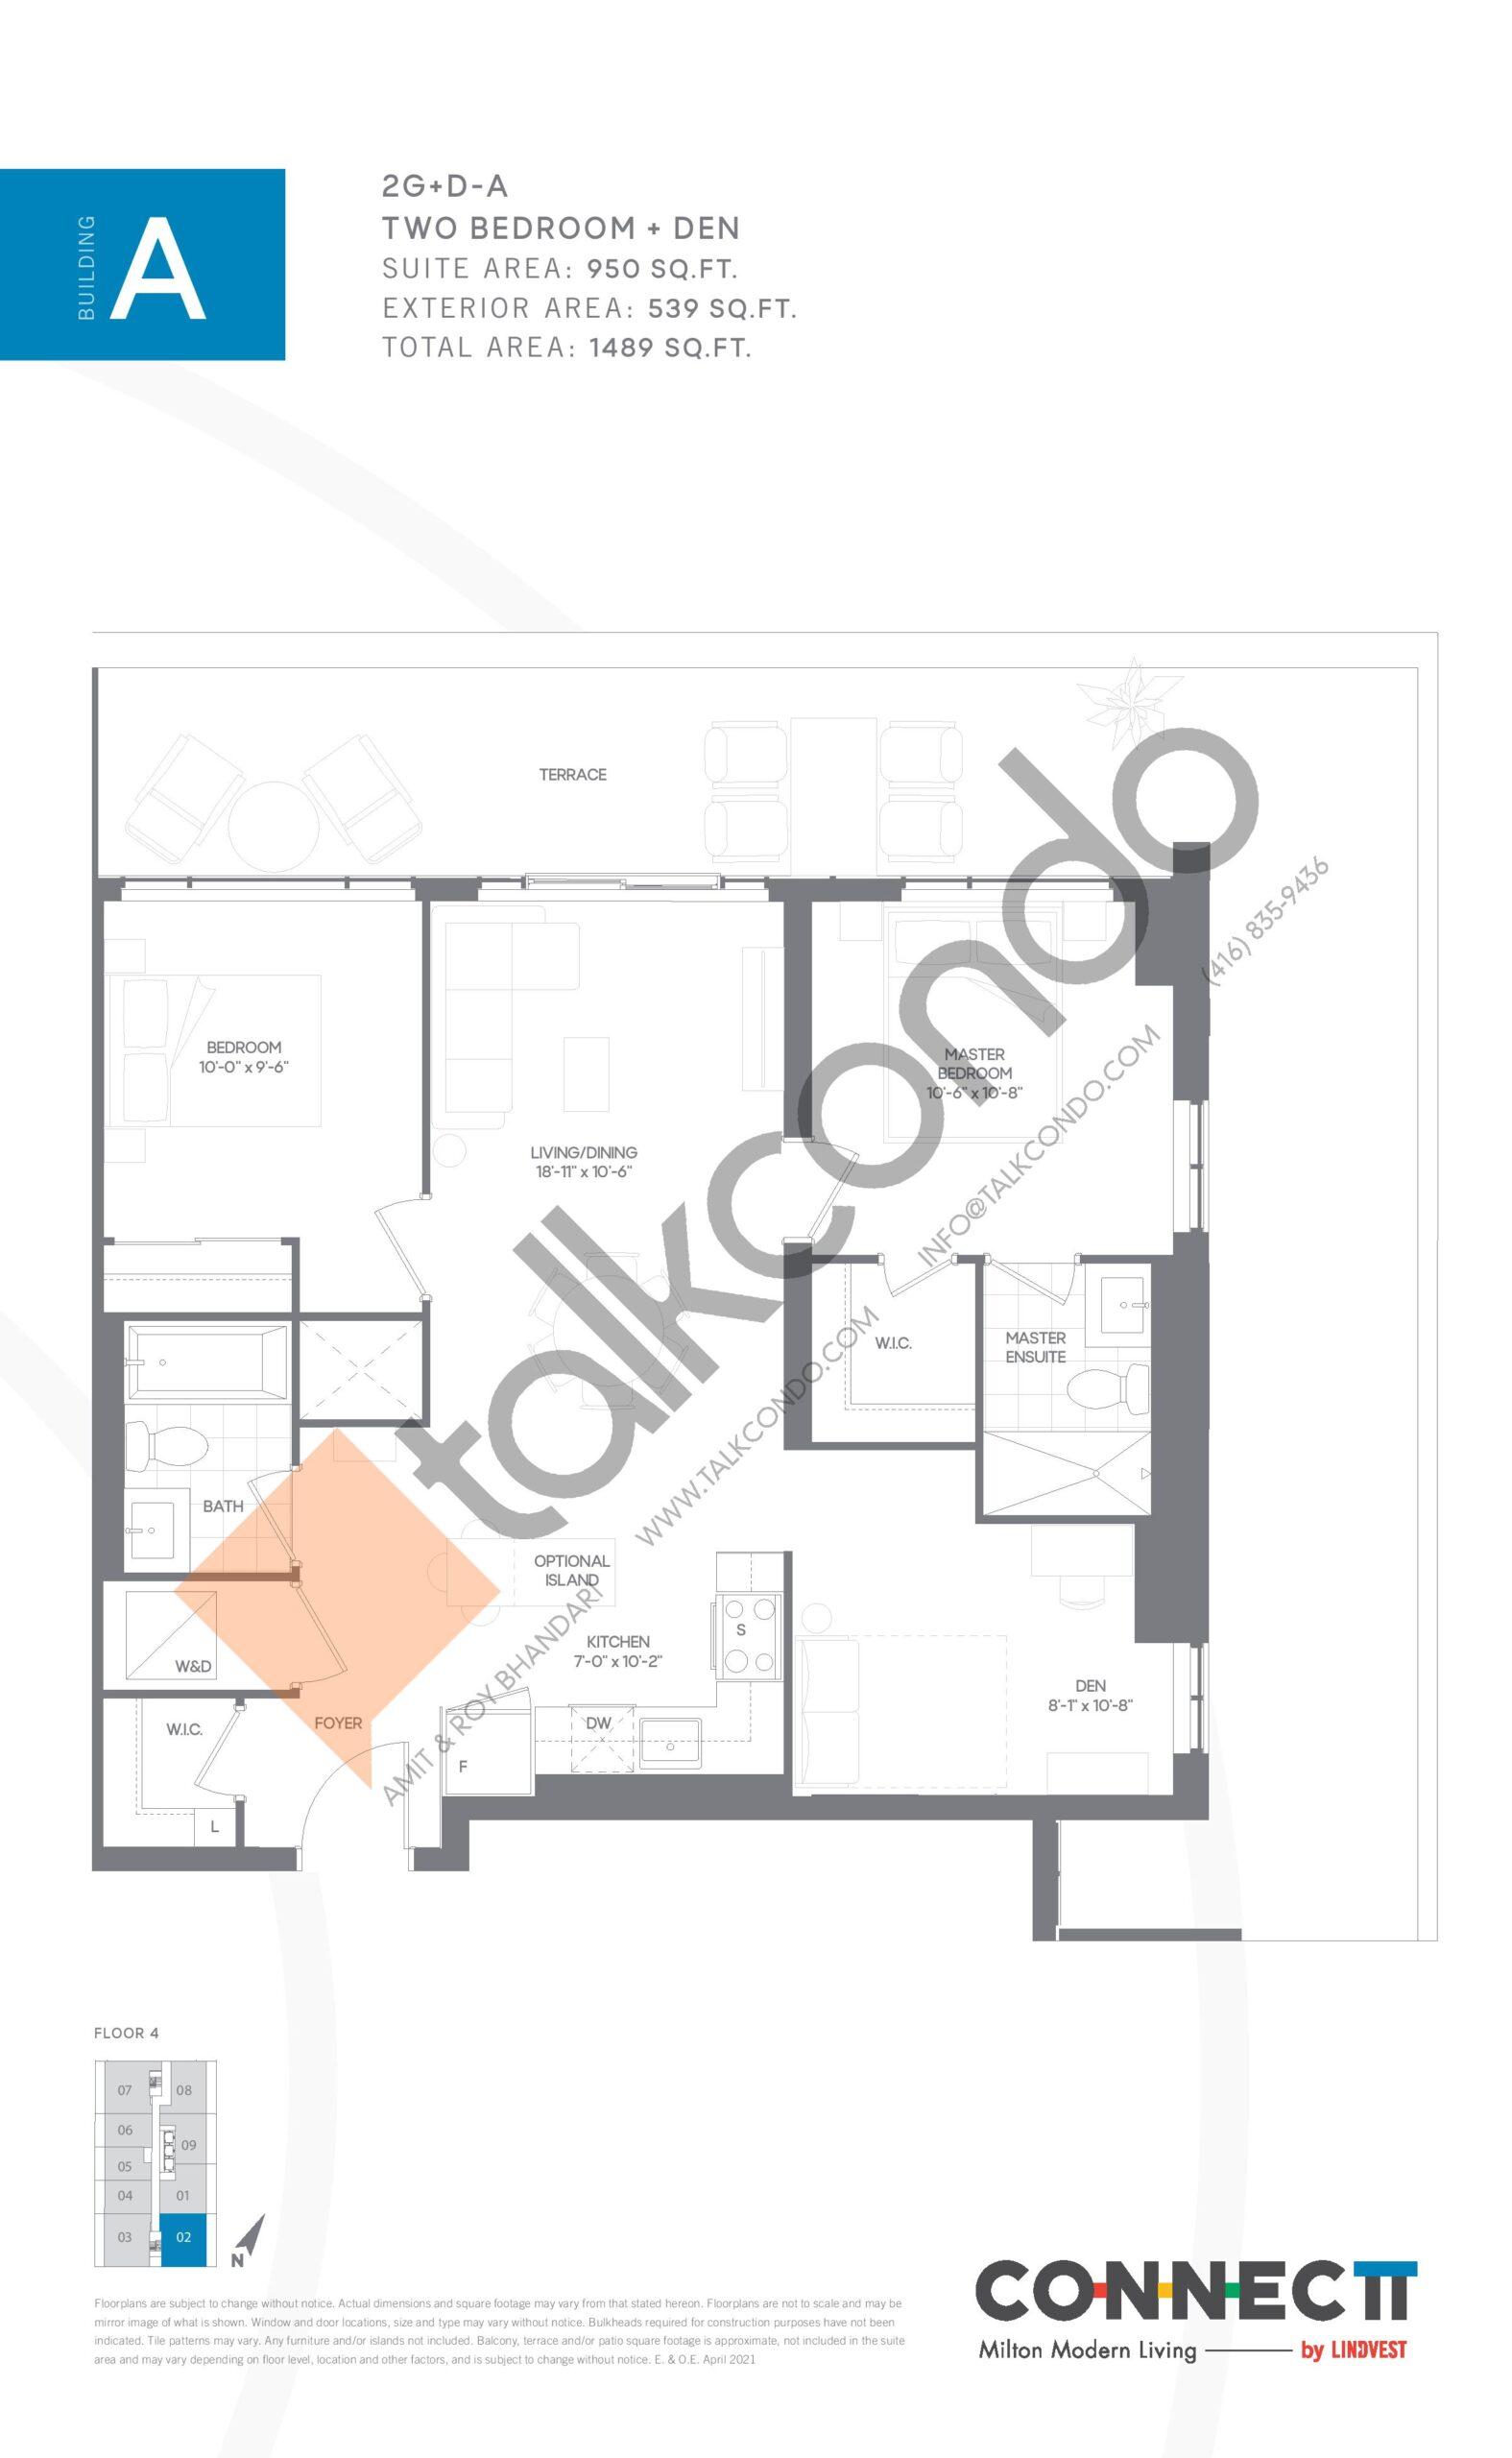 2G+D-A Floor Plan at Connectt Urban Community Condos - 950 sq.ft